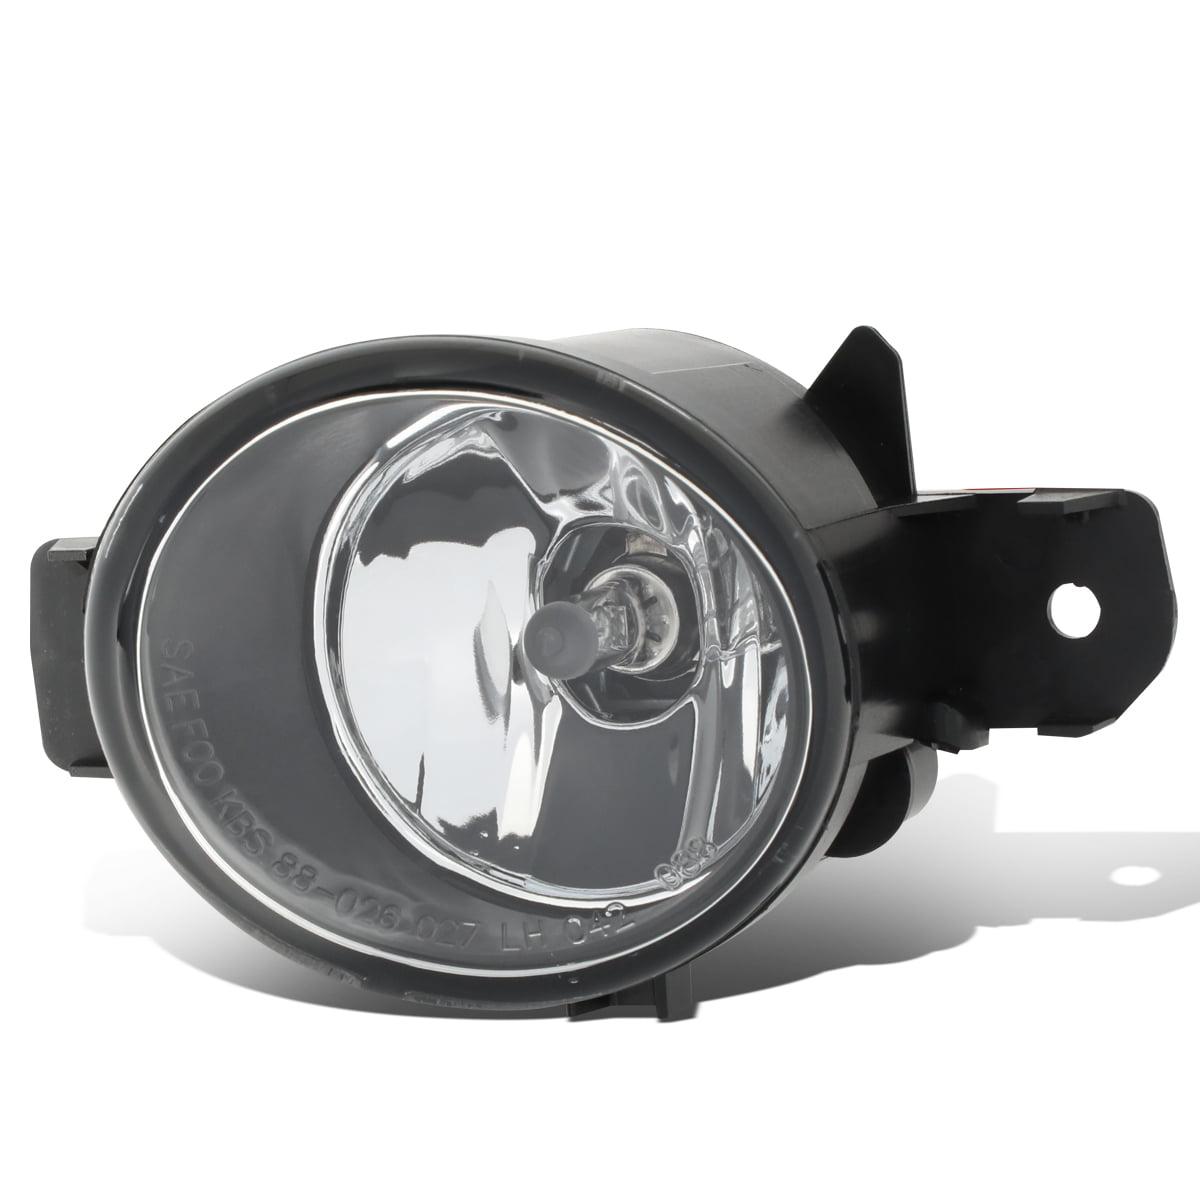 For 04-18 Nissan Sentra/Altima/Infiniti G37/QX60 Left Side Fog Light/Lamp Maxima/Murano/Pathfinder 05 06 07 08 09 10 11 12 13 14 15 16 17